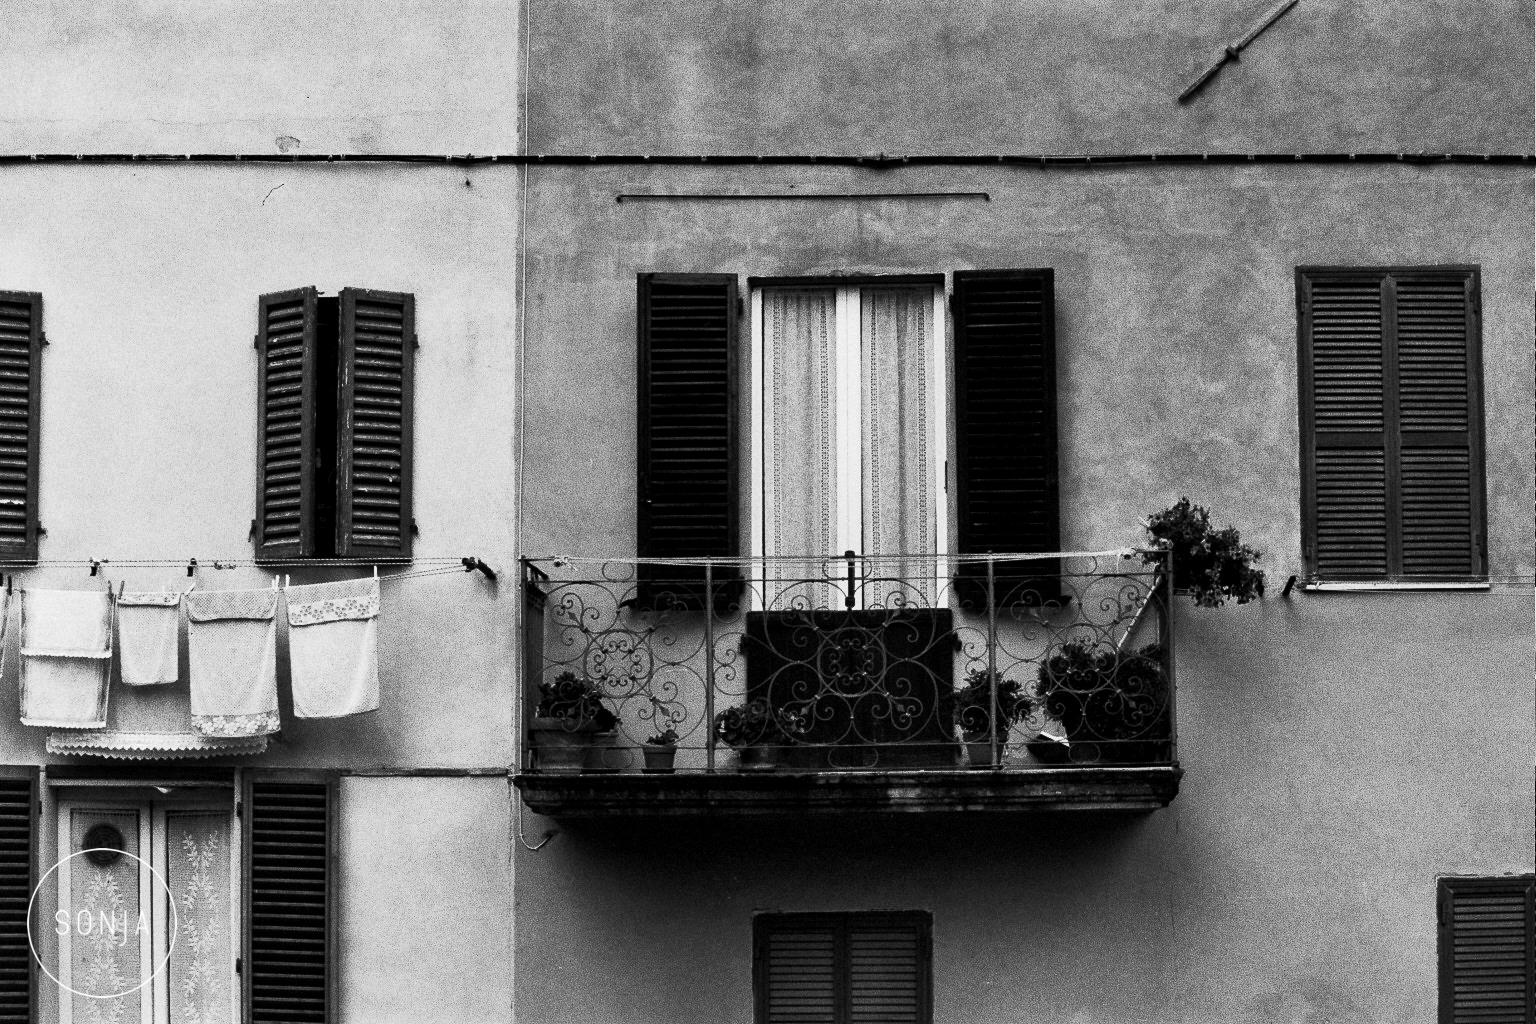 Sonja Lyon Photography-1-2.jpg